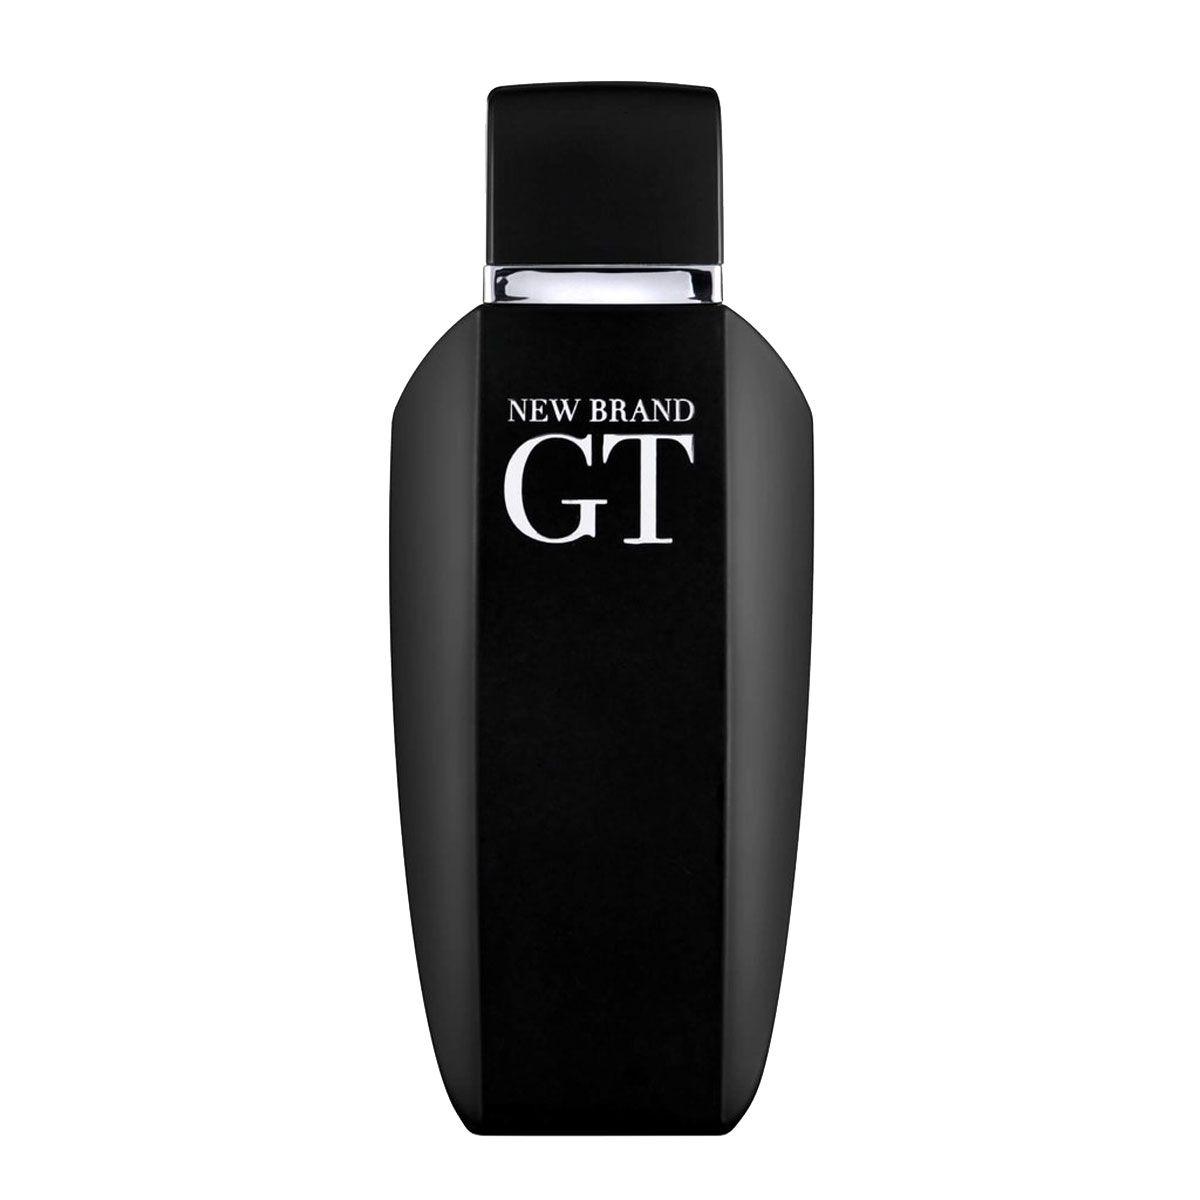 GT For Men Eau de Toilette New Brand - Perfume Masculino 100ml